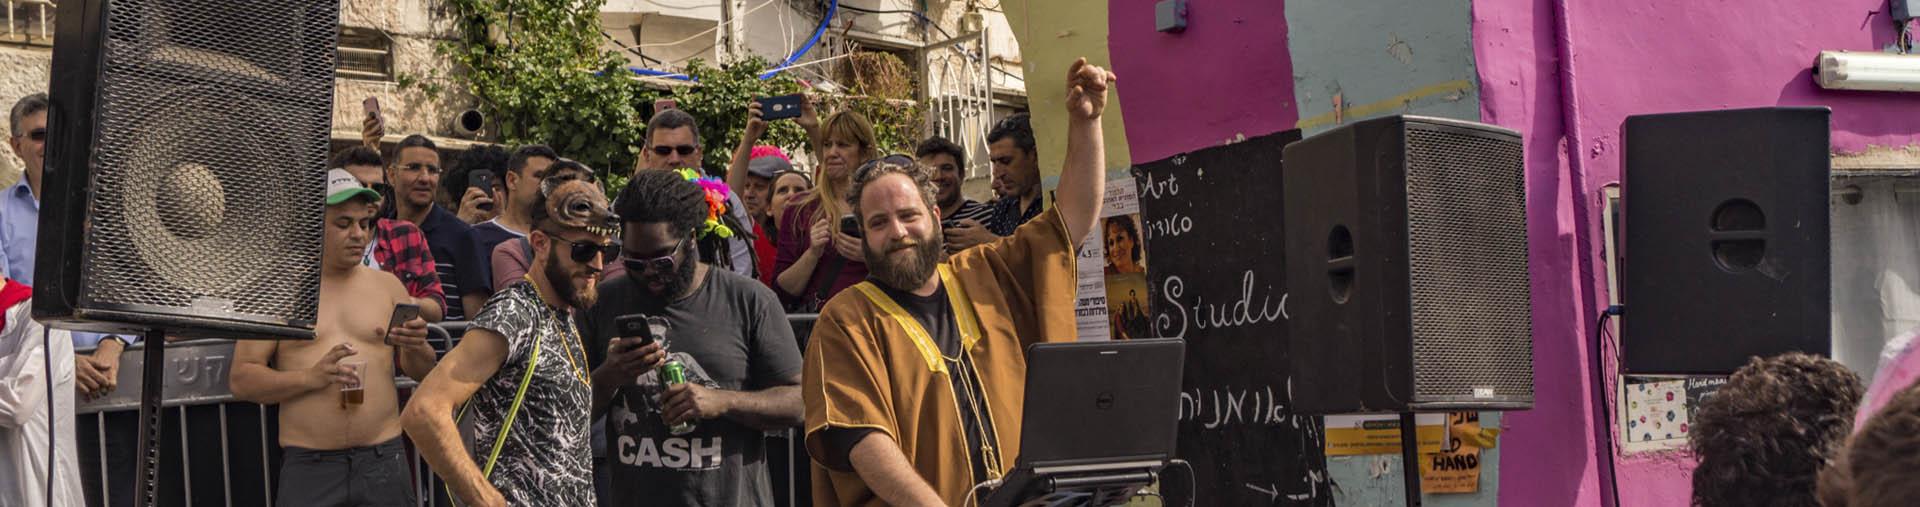 Purim street party